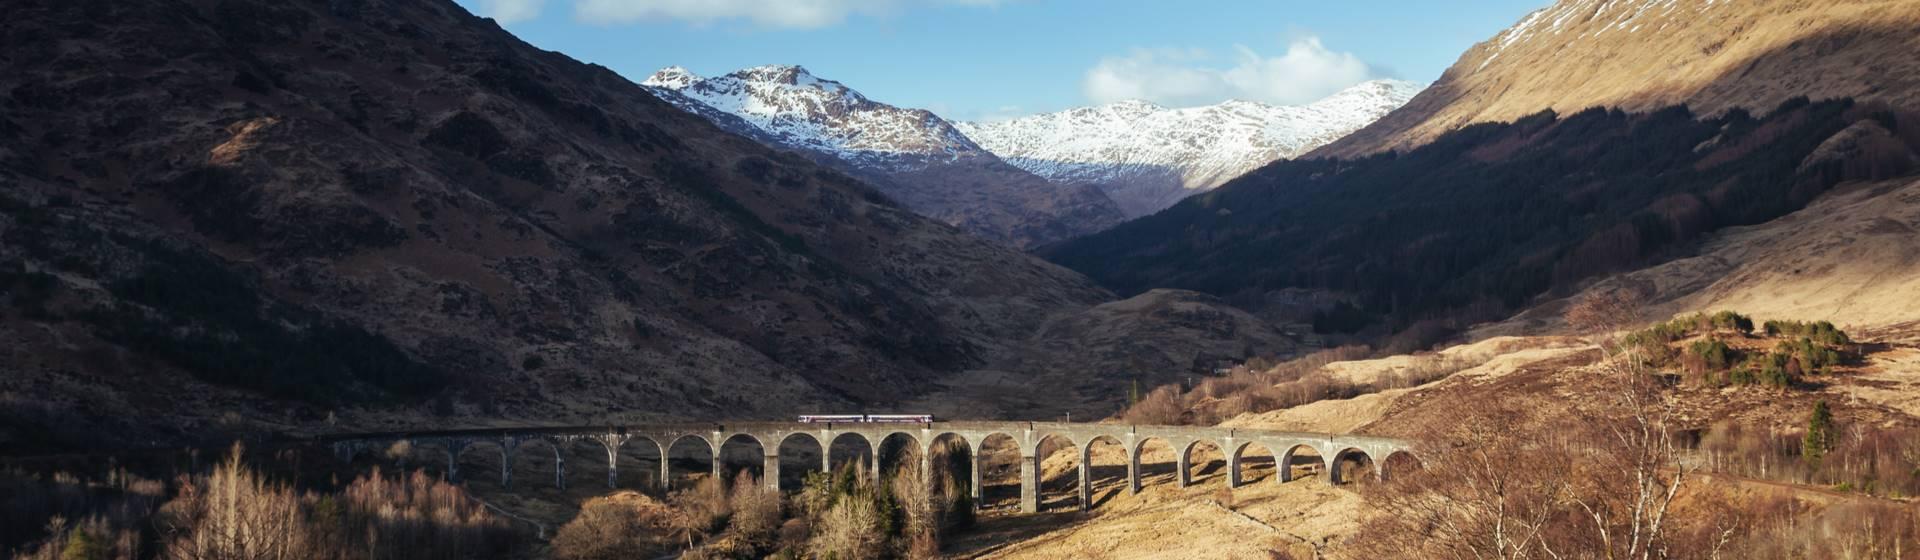 "<img src=""glenfinnanviaductwinter-shutterstockpan.jpeg"" alt=""Glenfinnan Viaduct in Winter""/>"